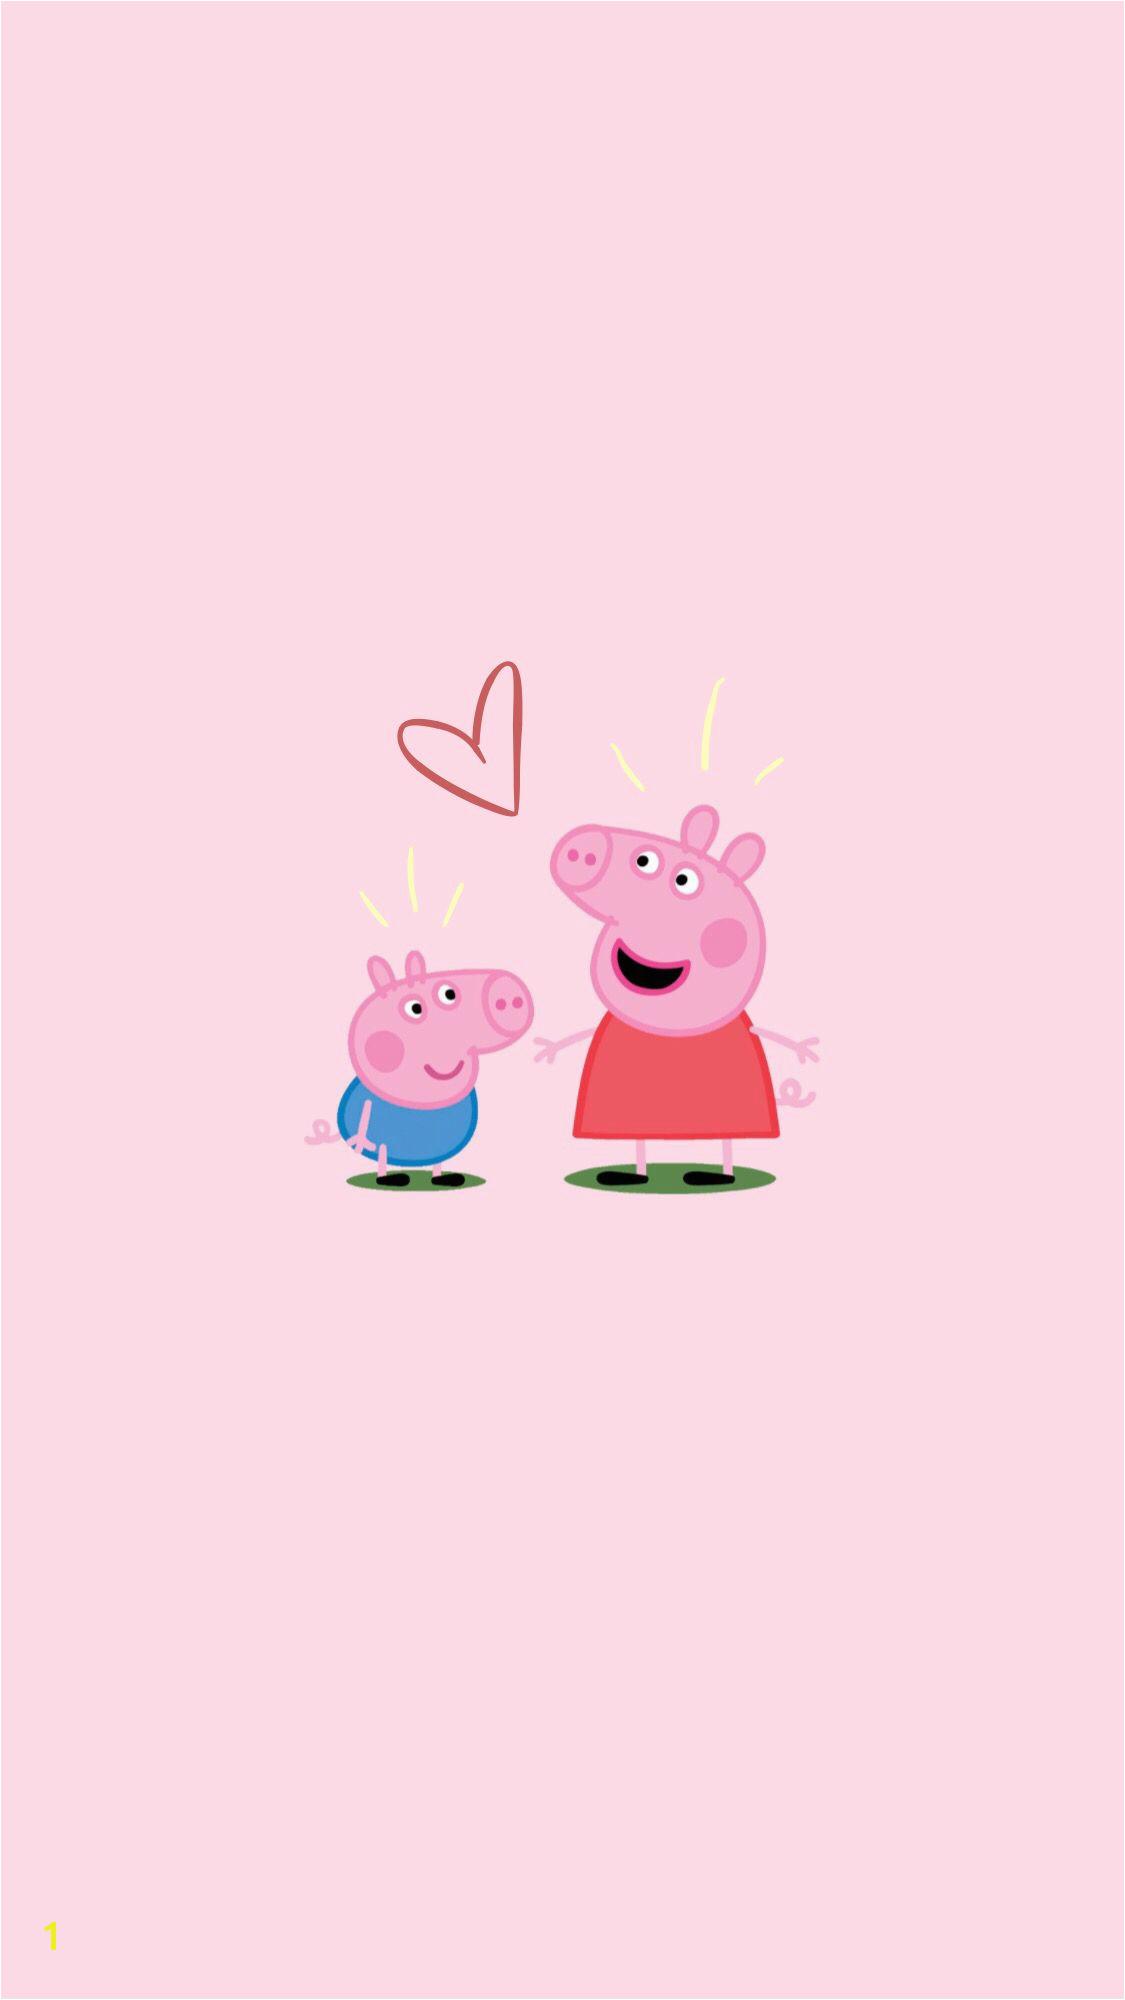 peppa pig wallpaper